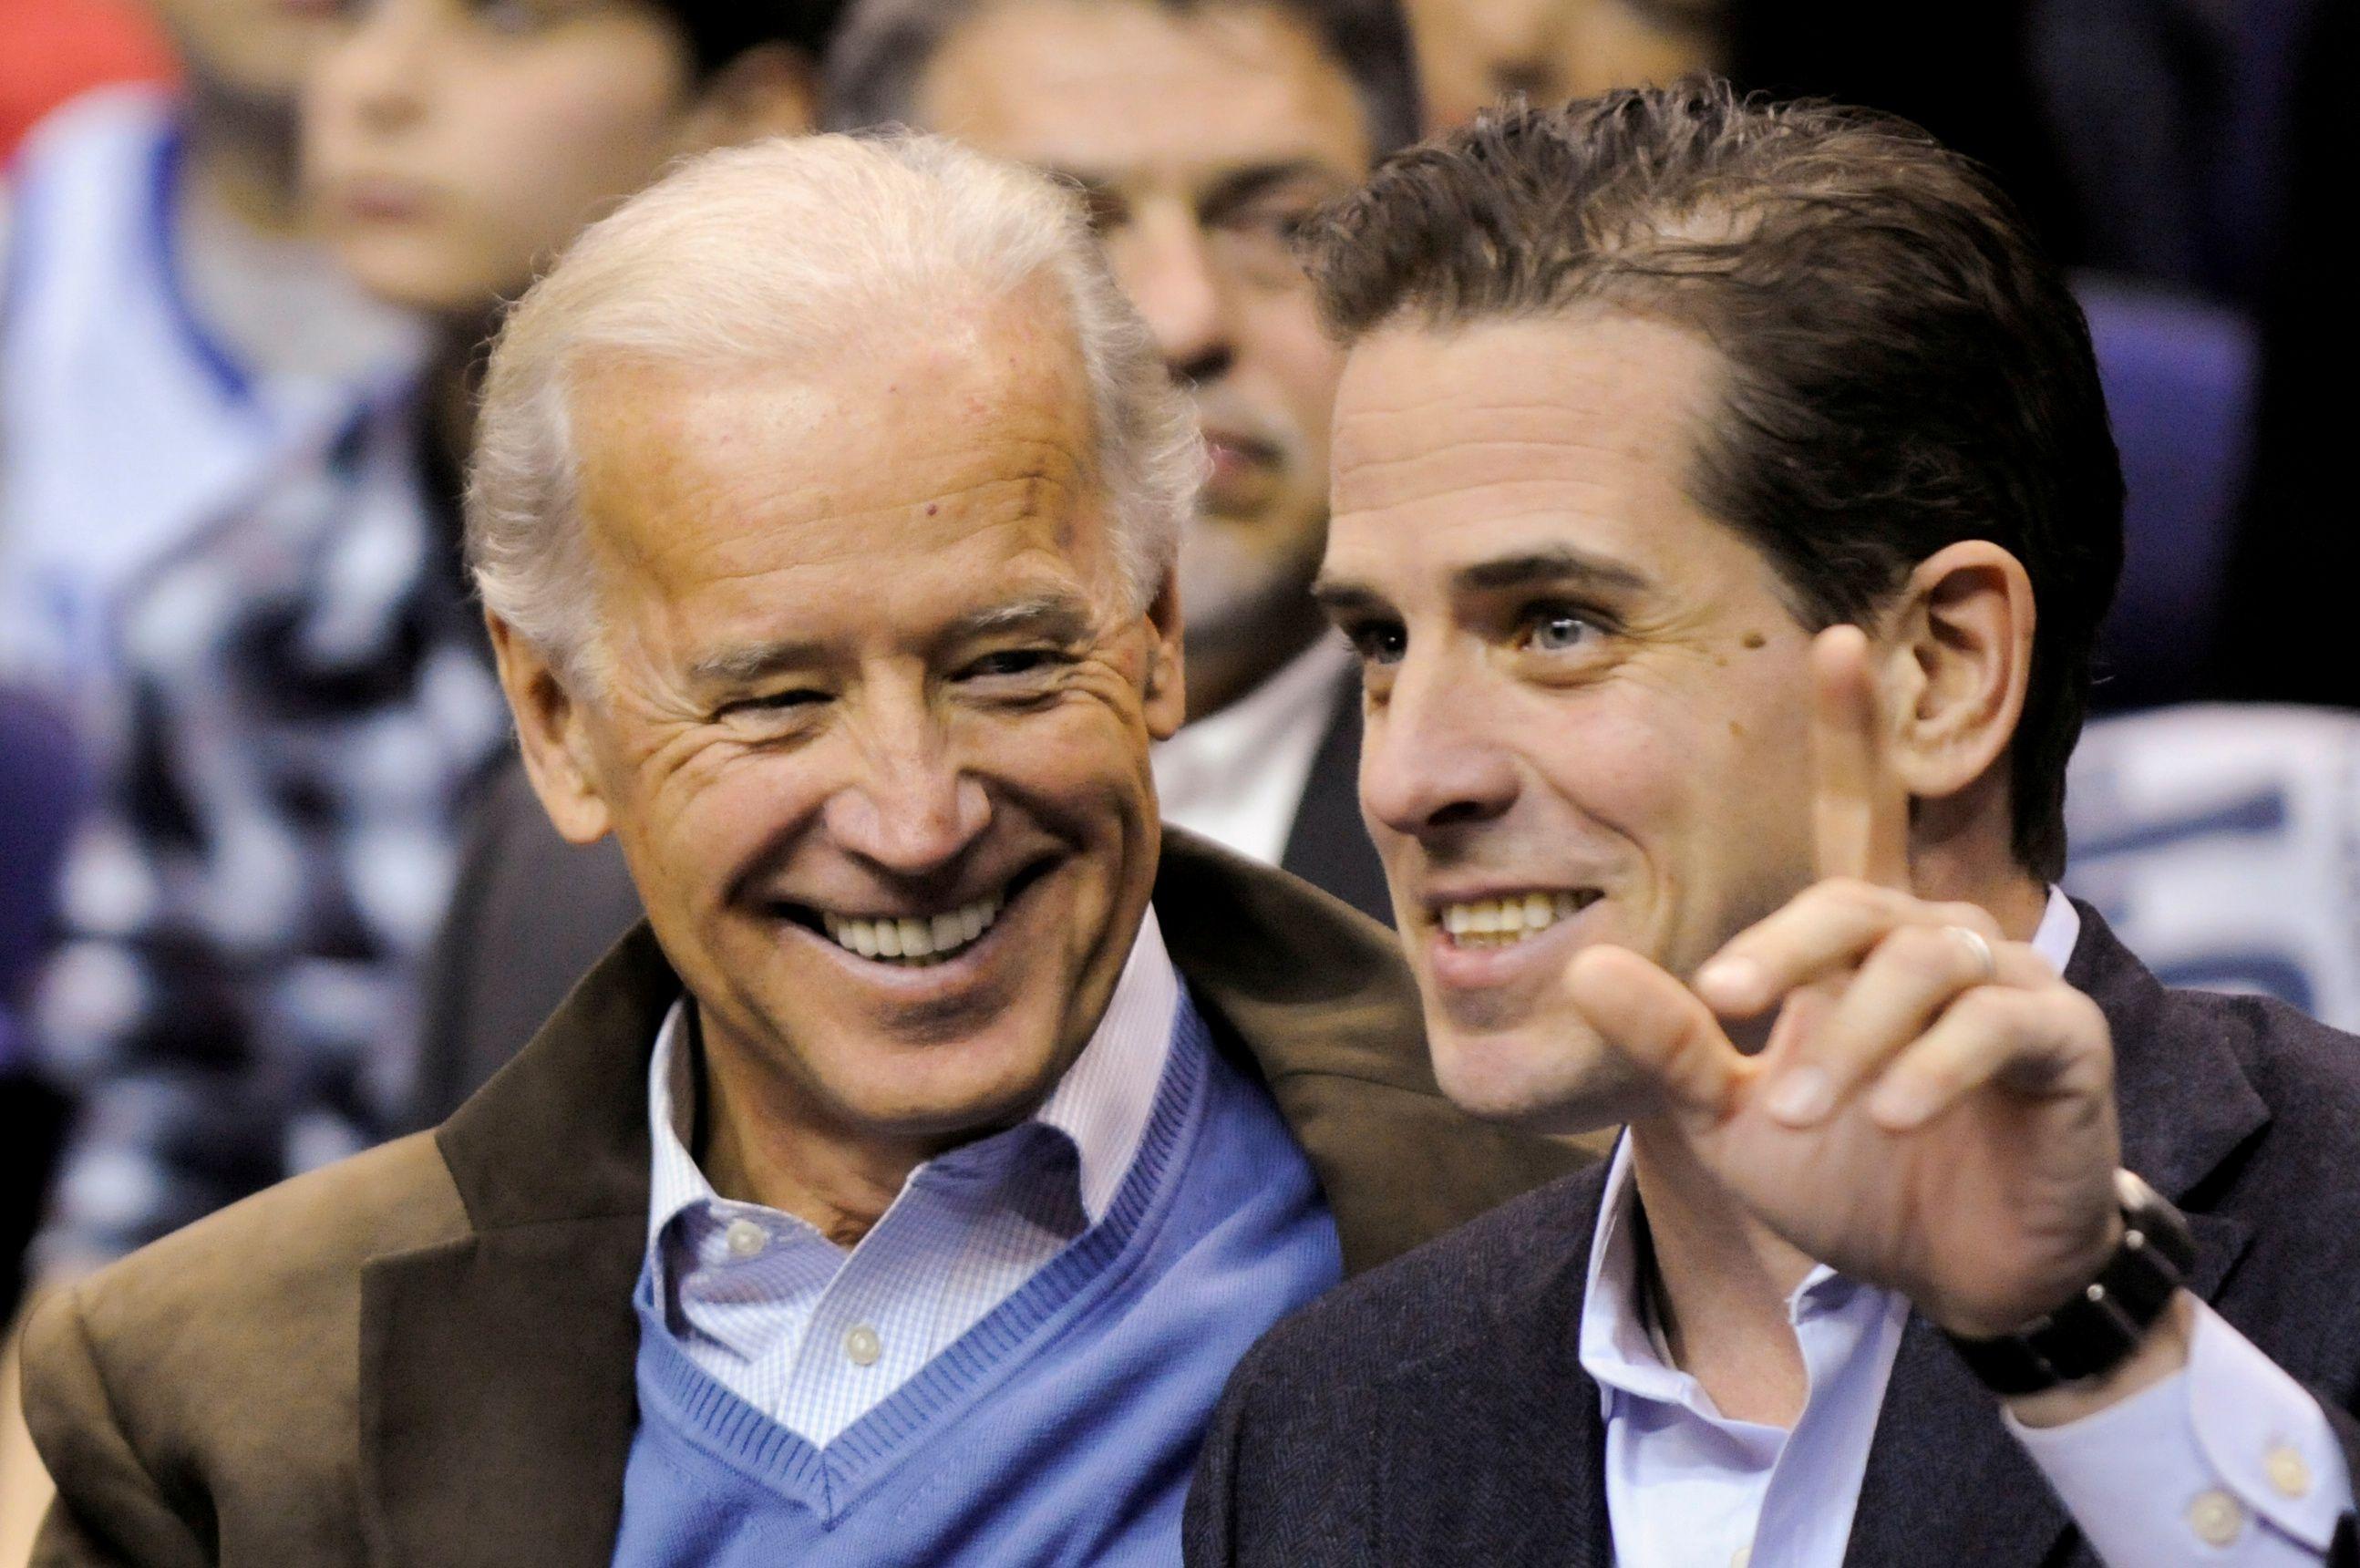 Joe Biden with his son Hunter Biden. REUTERS/Jonathan Ernst/File Photo